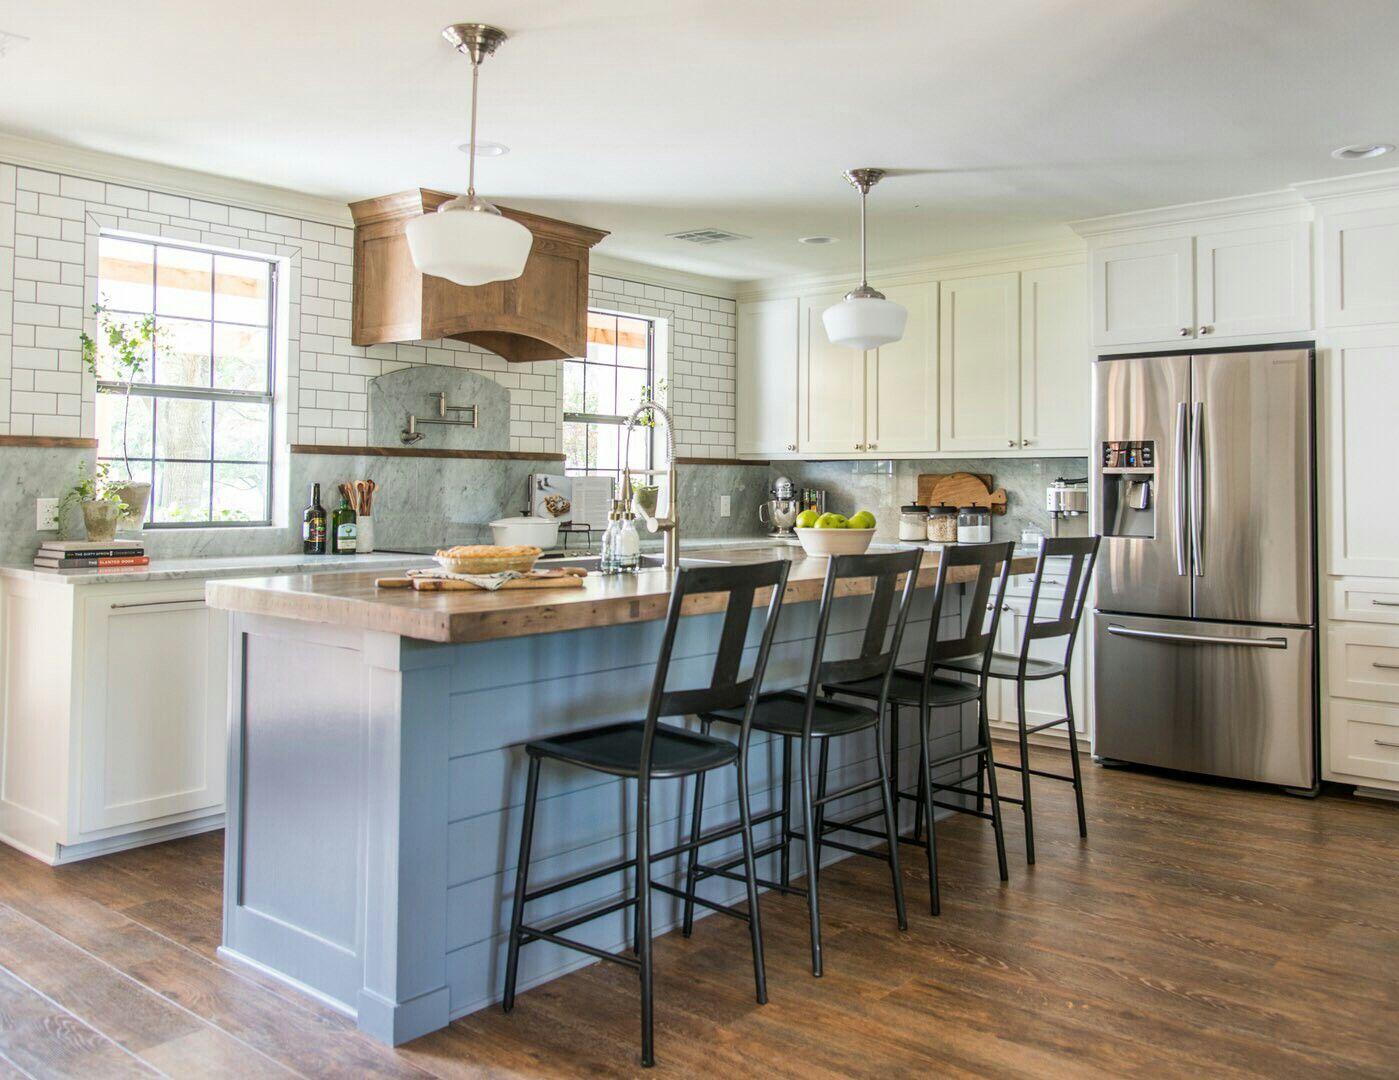 Fixer upper reclaimed wood kitchen island - Reclaimed Bowling Lane As Kitchen Island